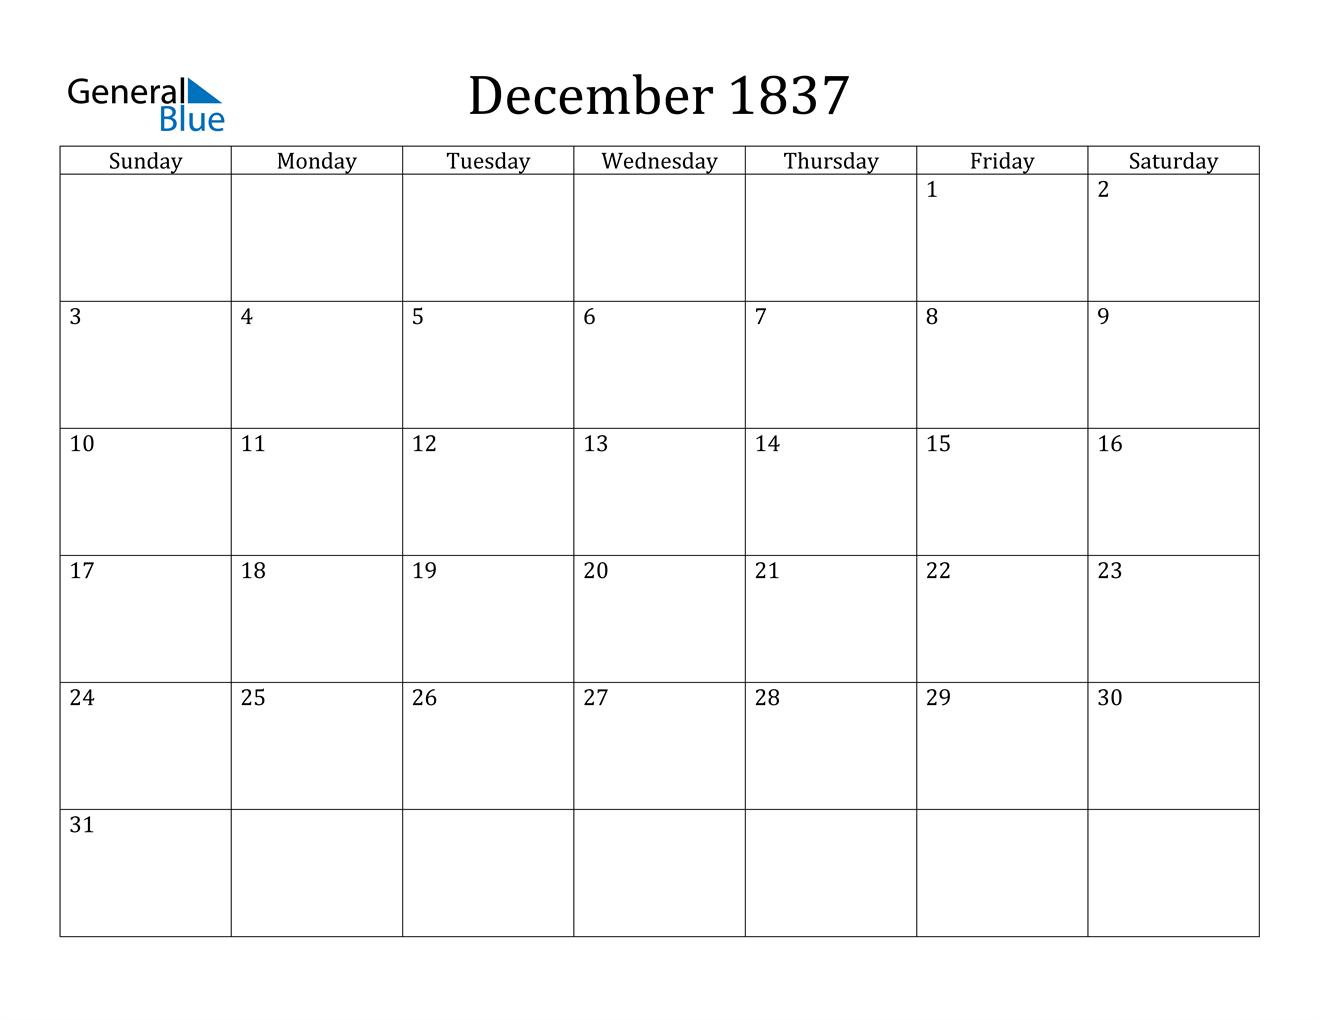 Image of December 1837 Calendar